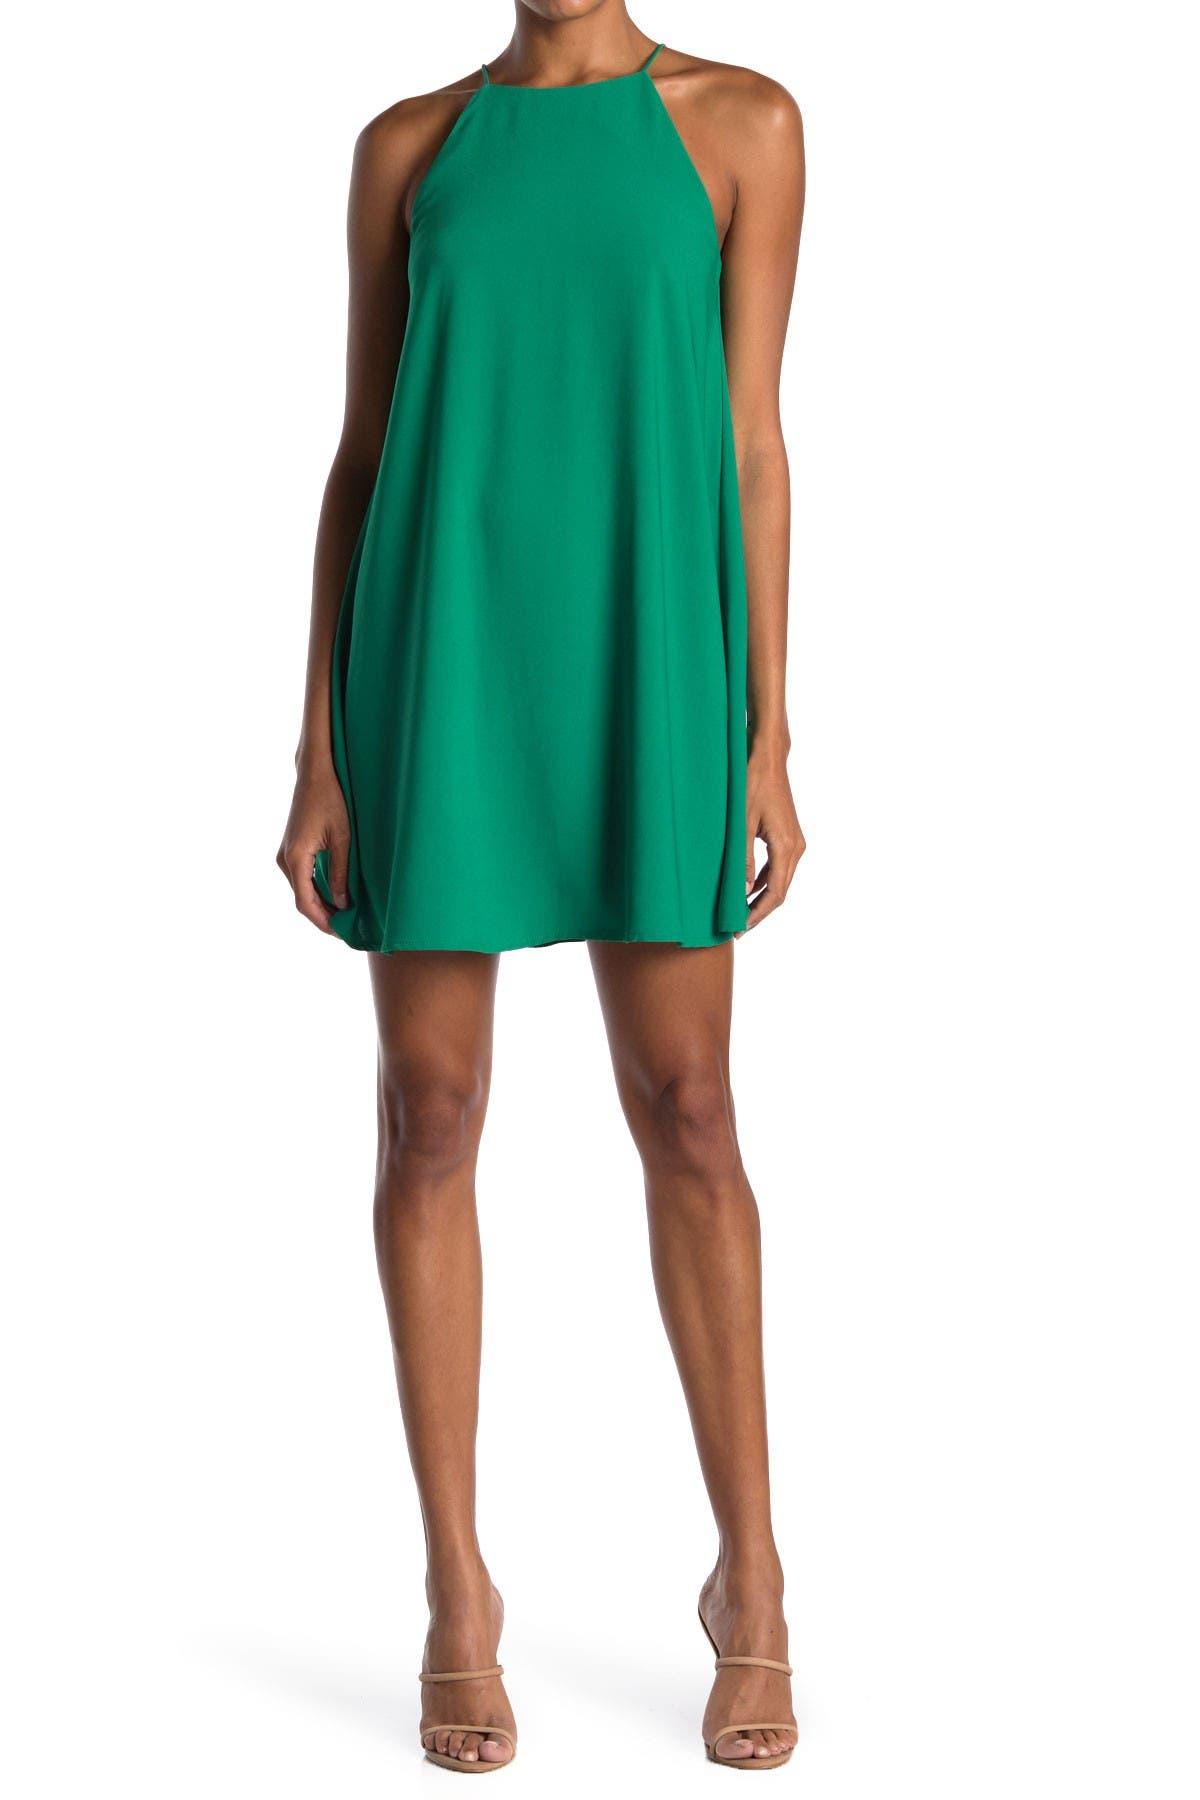 Image of MELLODAY Sleeveless Mini Swing Dress